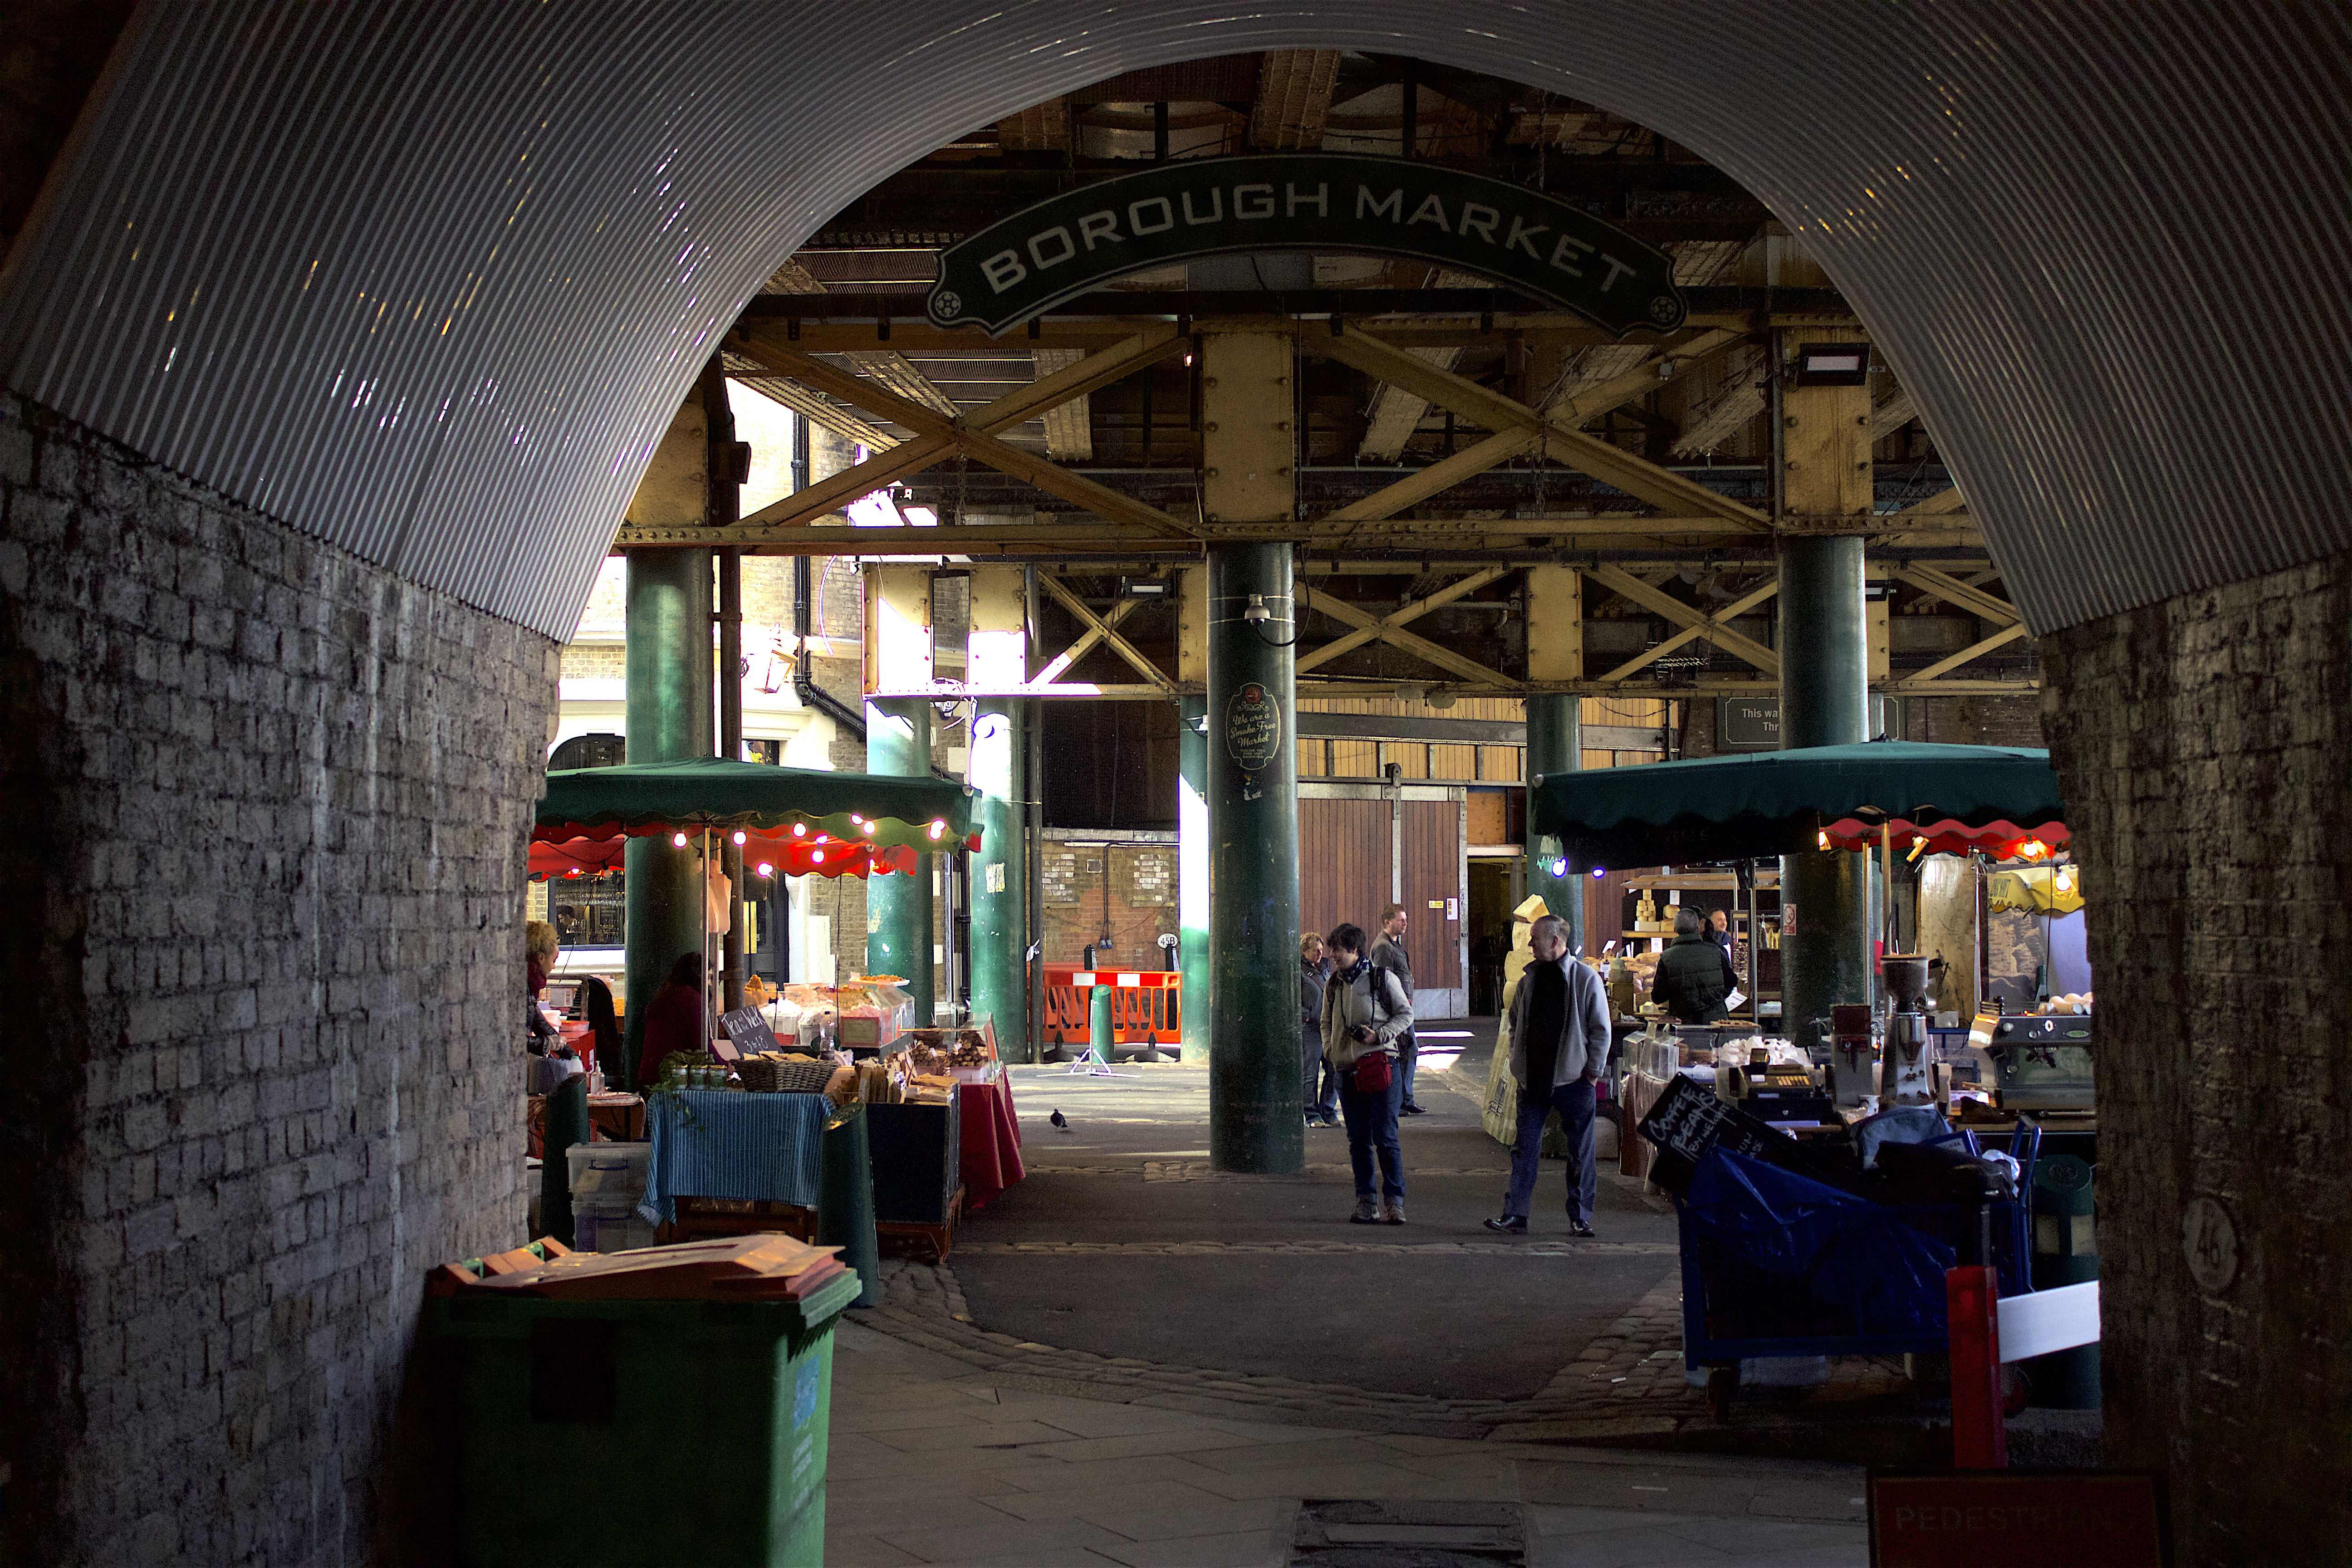 Borough_Market_Arches.jpg